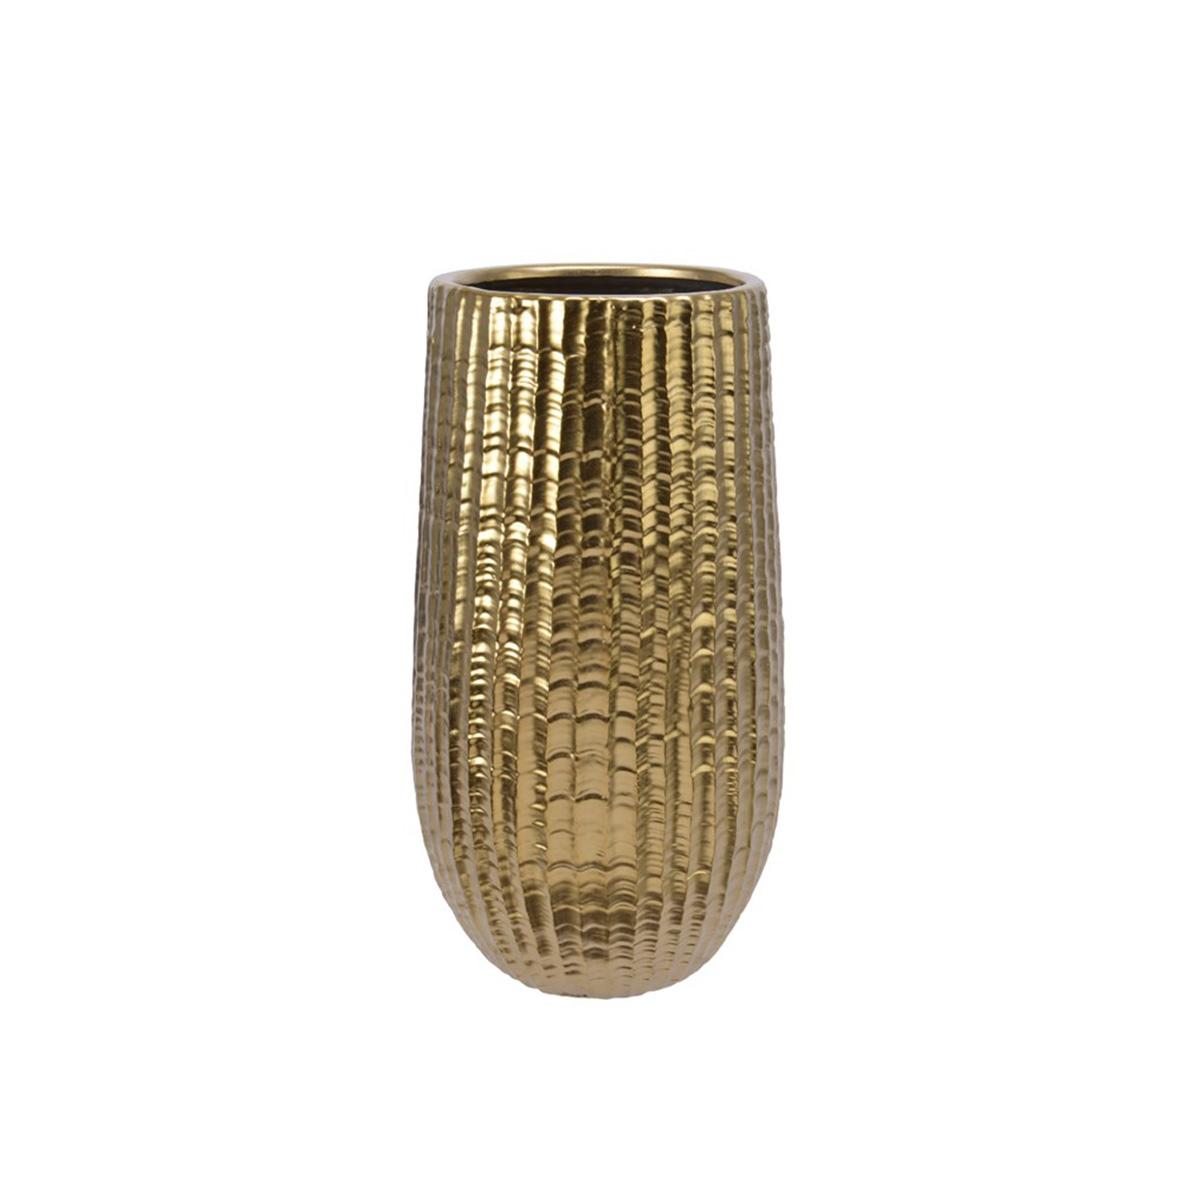 Vaza zlatna 650209